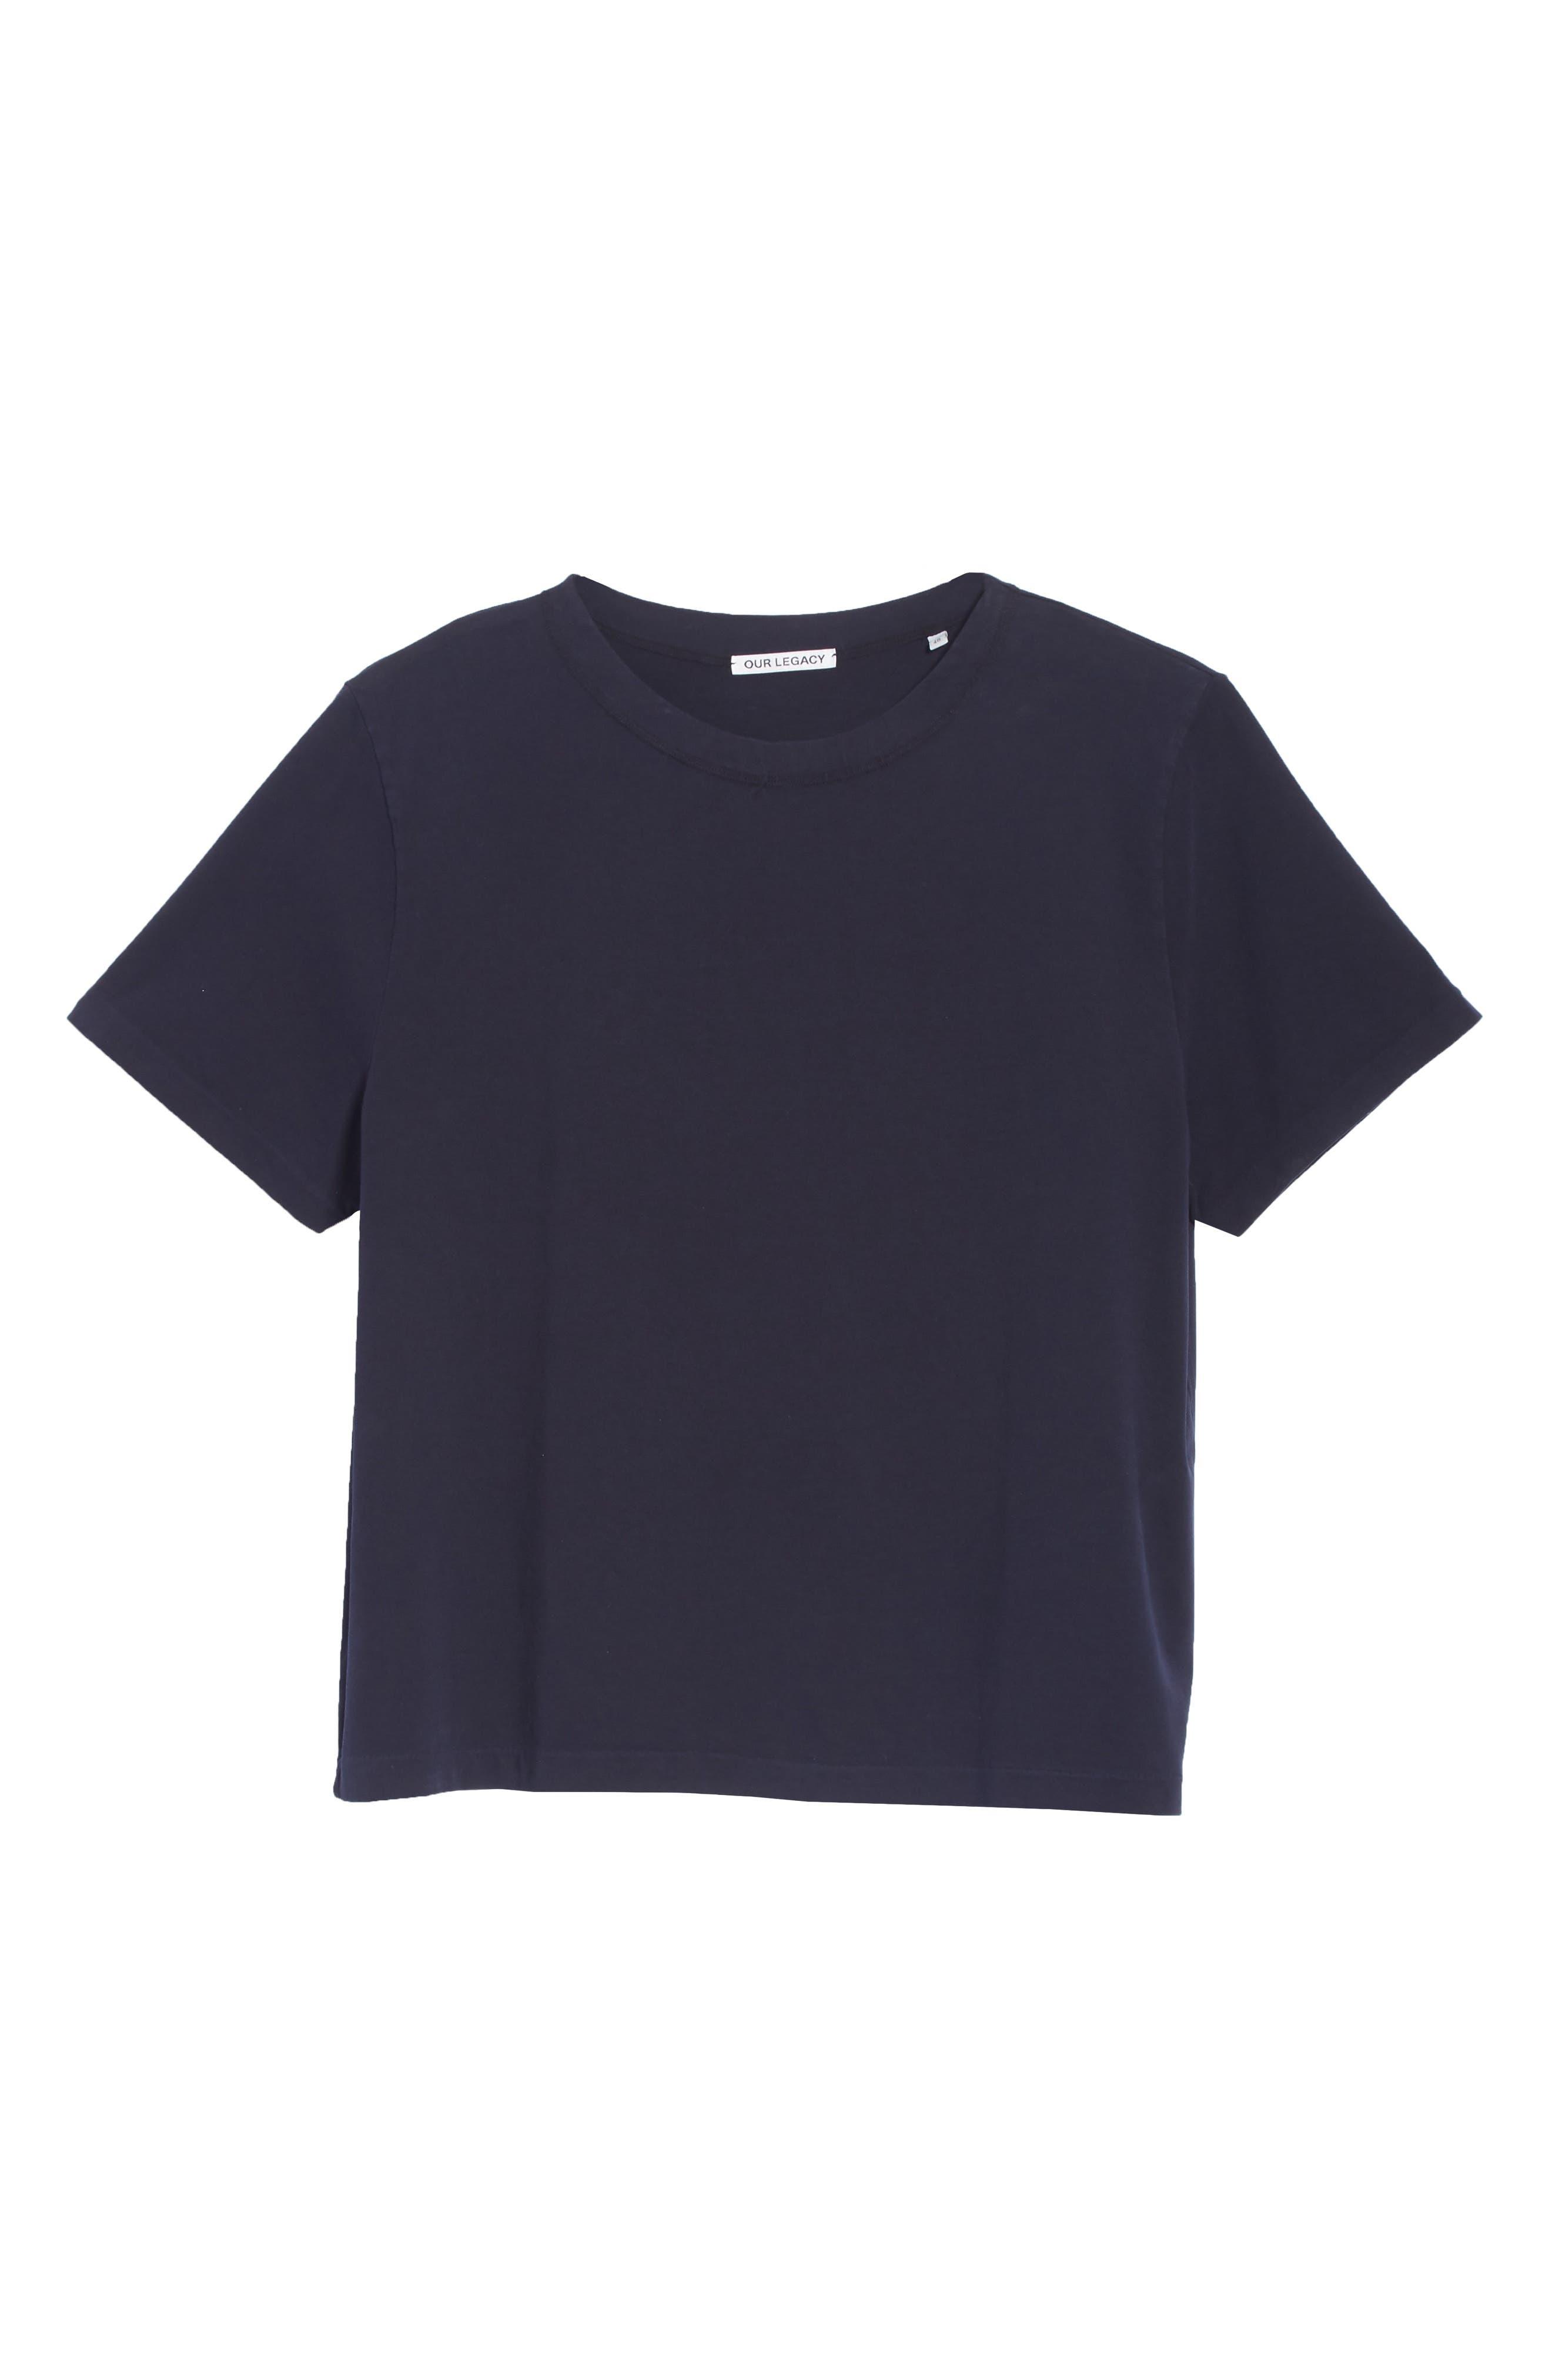 Clean Box T-Shirt,                             Alternate thumbnail 6, color,                             NAVY